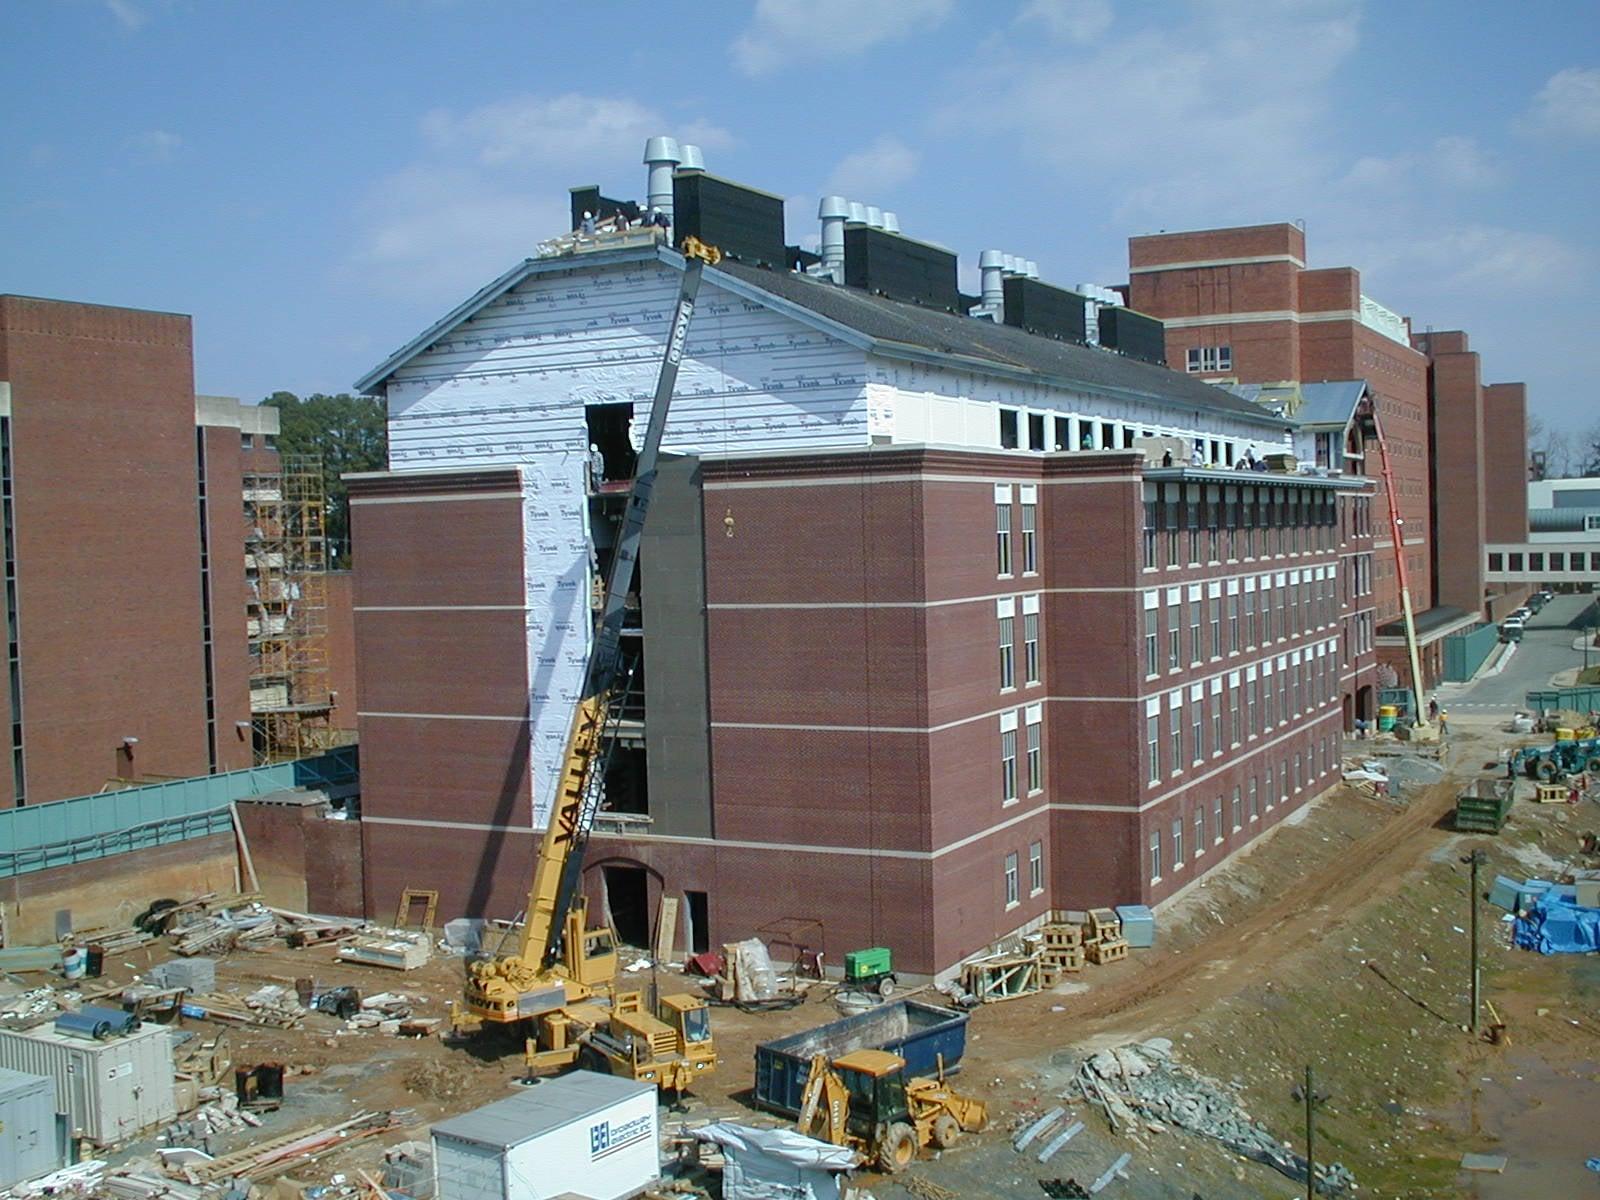 BRIDGEWATER COLLEGE SCIENCE BUILDING - MCKINNEY HALL